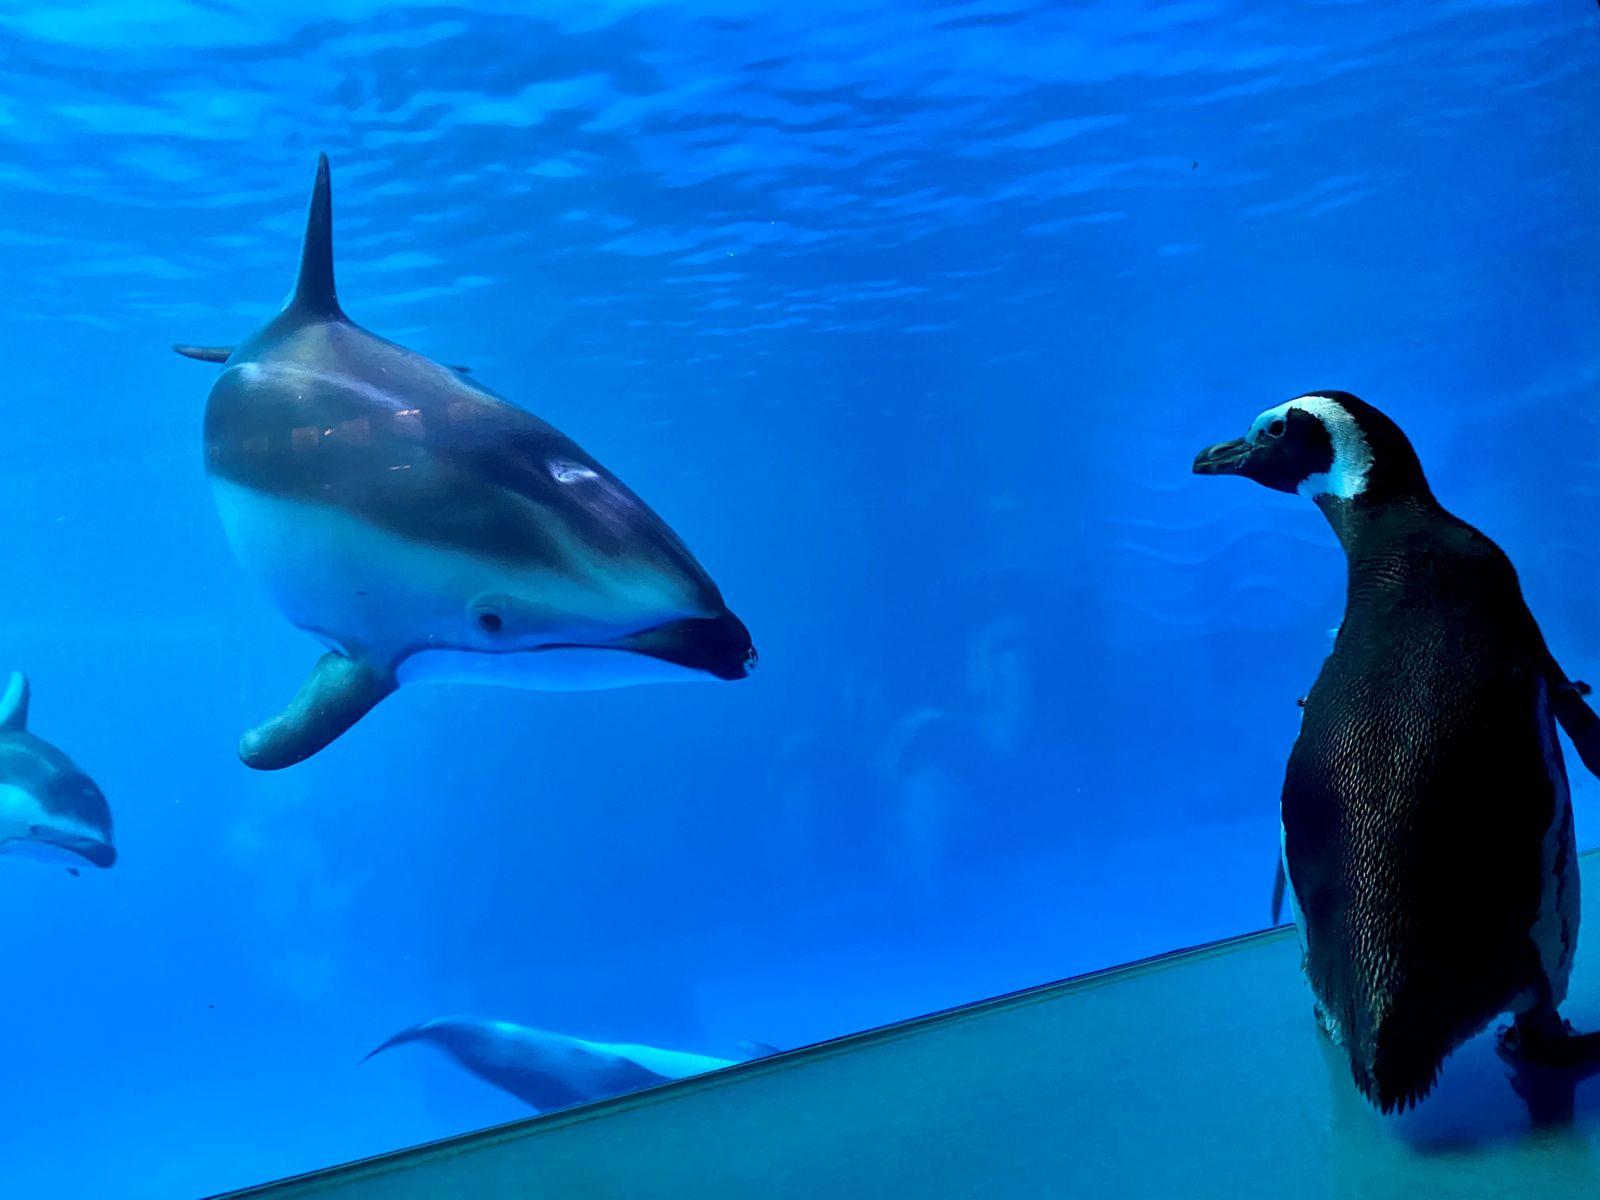 Wellington, a 32-year-old rockhopper penguin, meets other animals as exploring the aquarium's Amazon Rising exhibit at Shedd Aquarium in Chicago